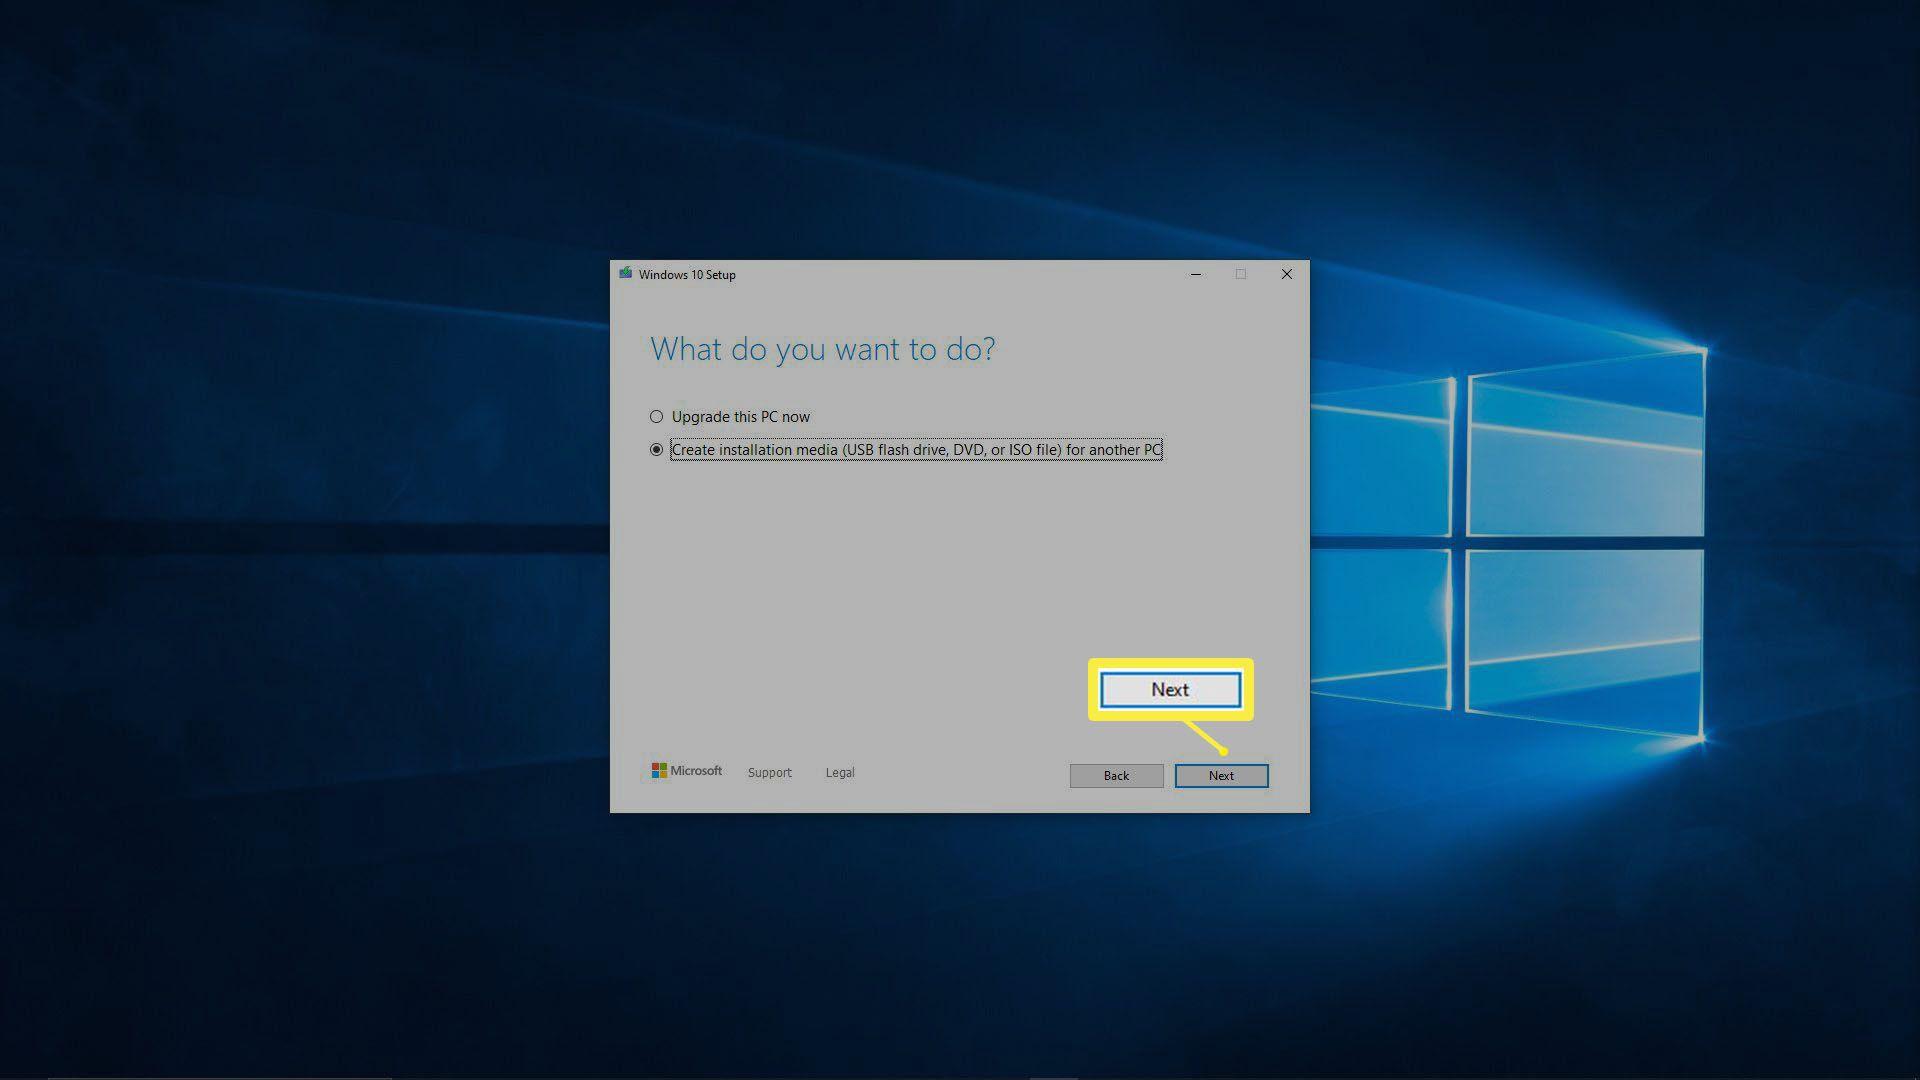 A screenshot of the Windows 10 media creation tool.